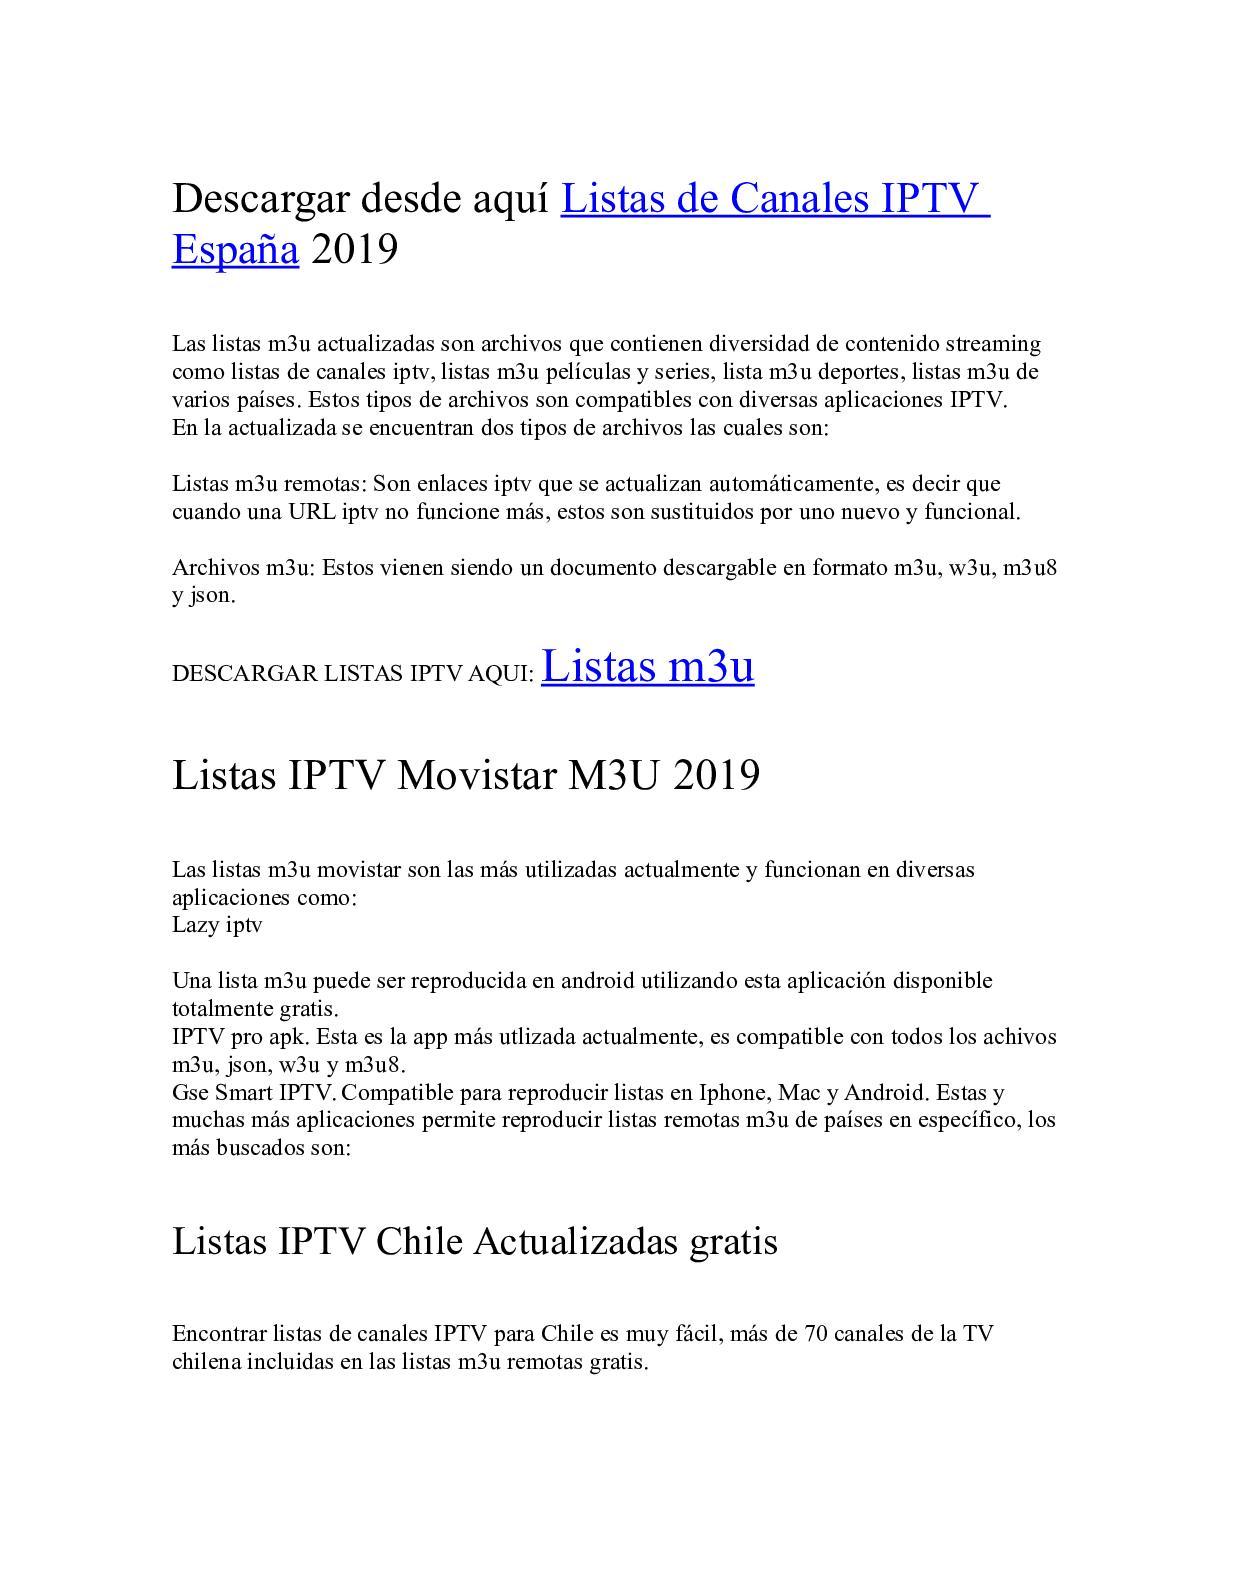 Calaméo Listas De Canales Iptv España M3u Gratis Actualizadas 2019